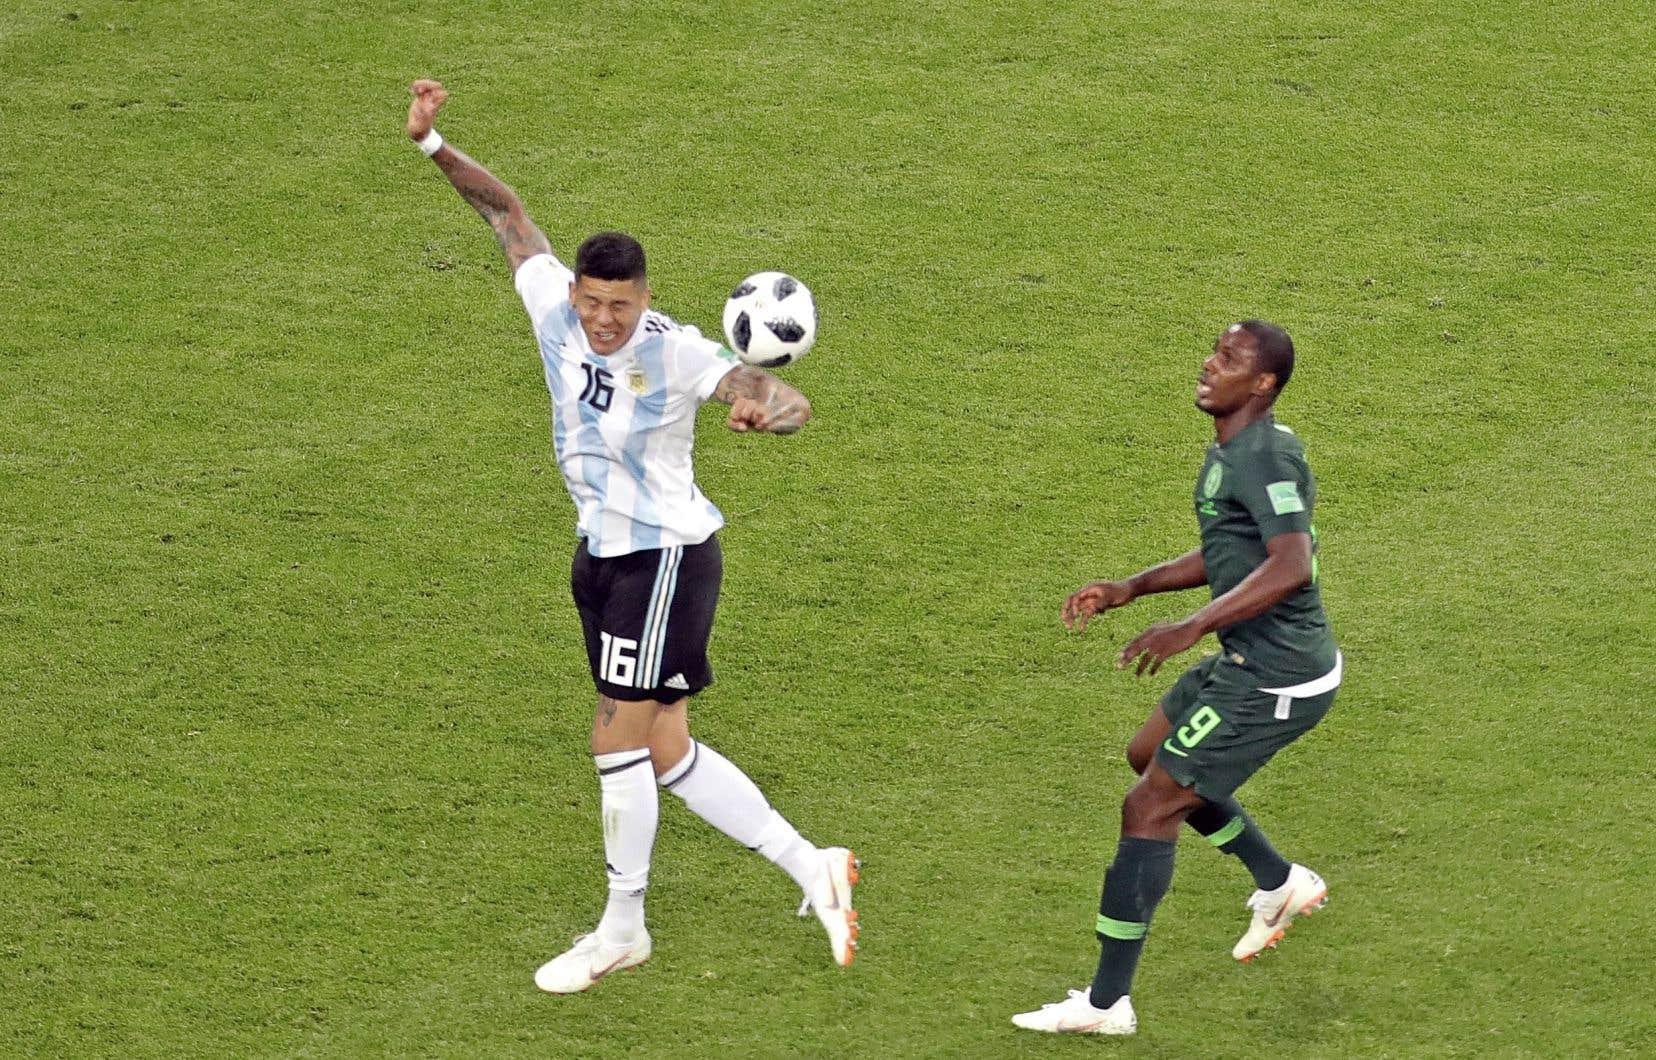 Le ballon touchant le bras de Marcos Rojo, mardi